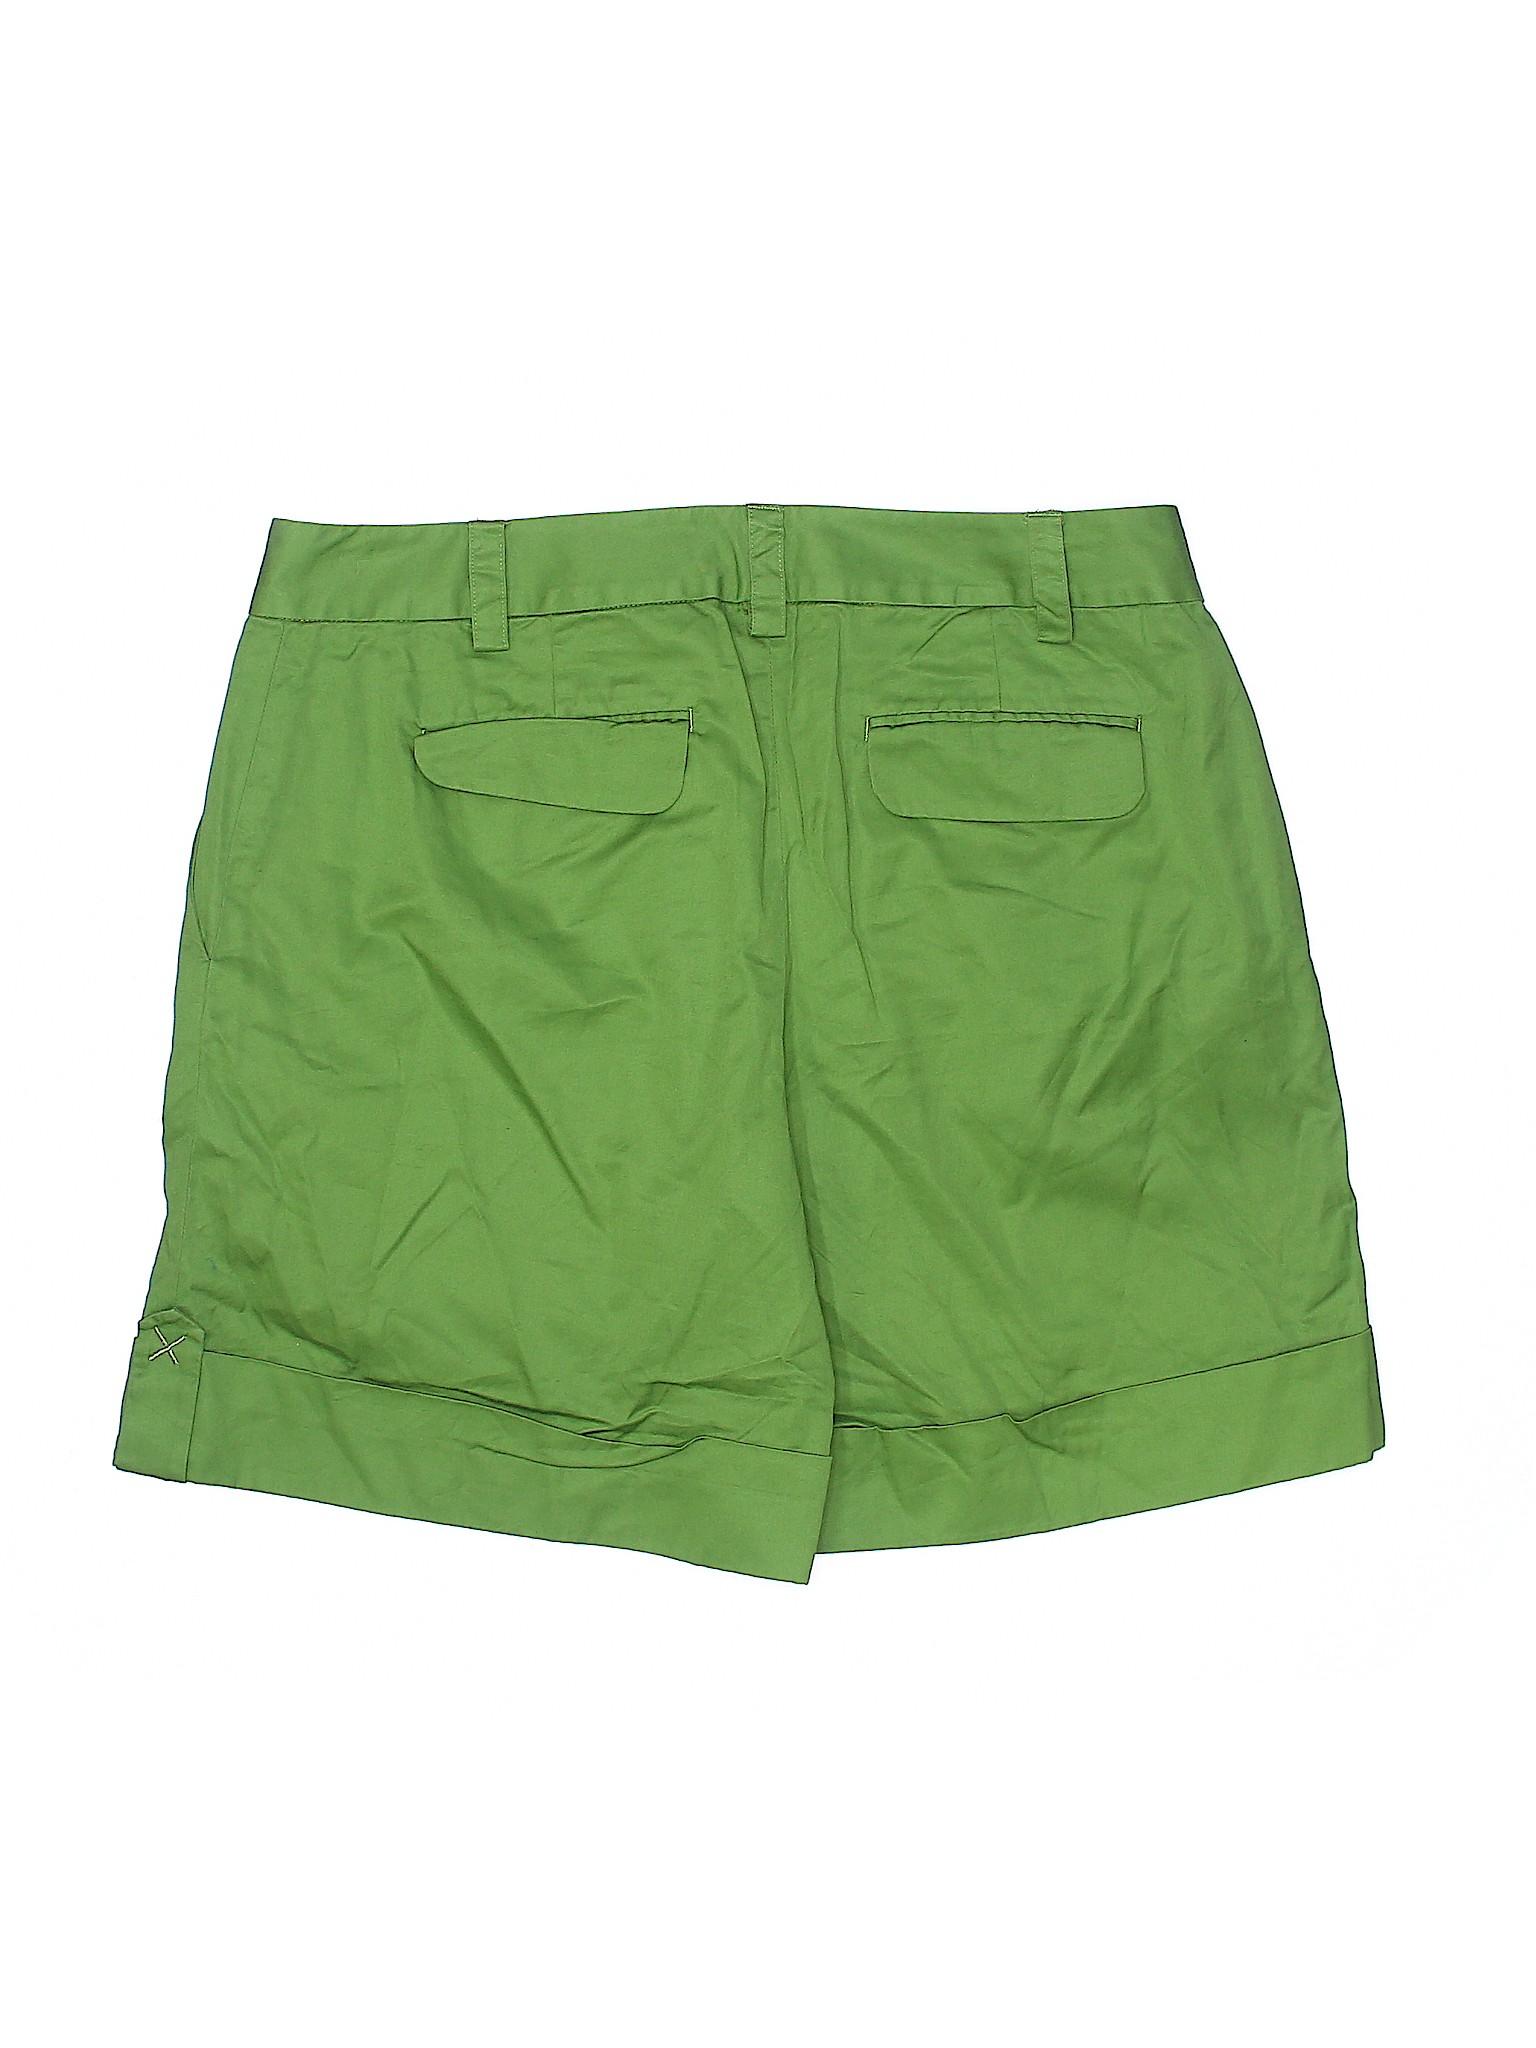 Shorts Khaki Boutique Saks Fifth Avenue xzqW7U4Cw